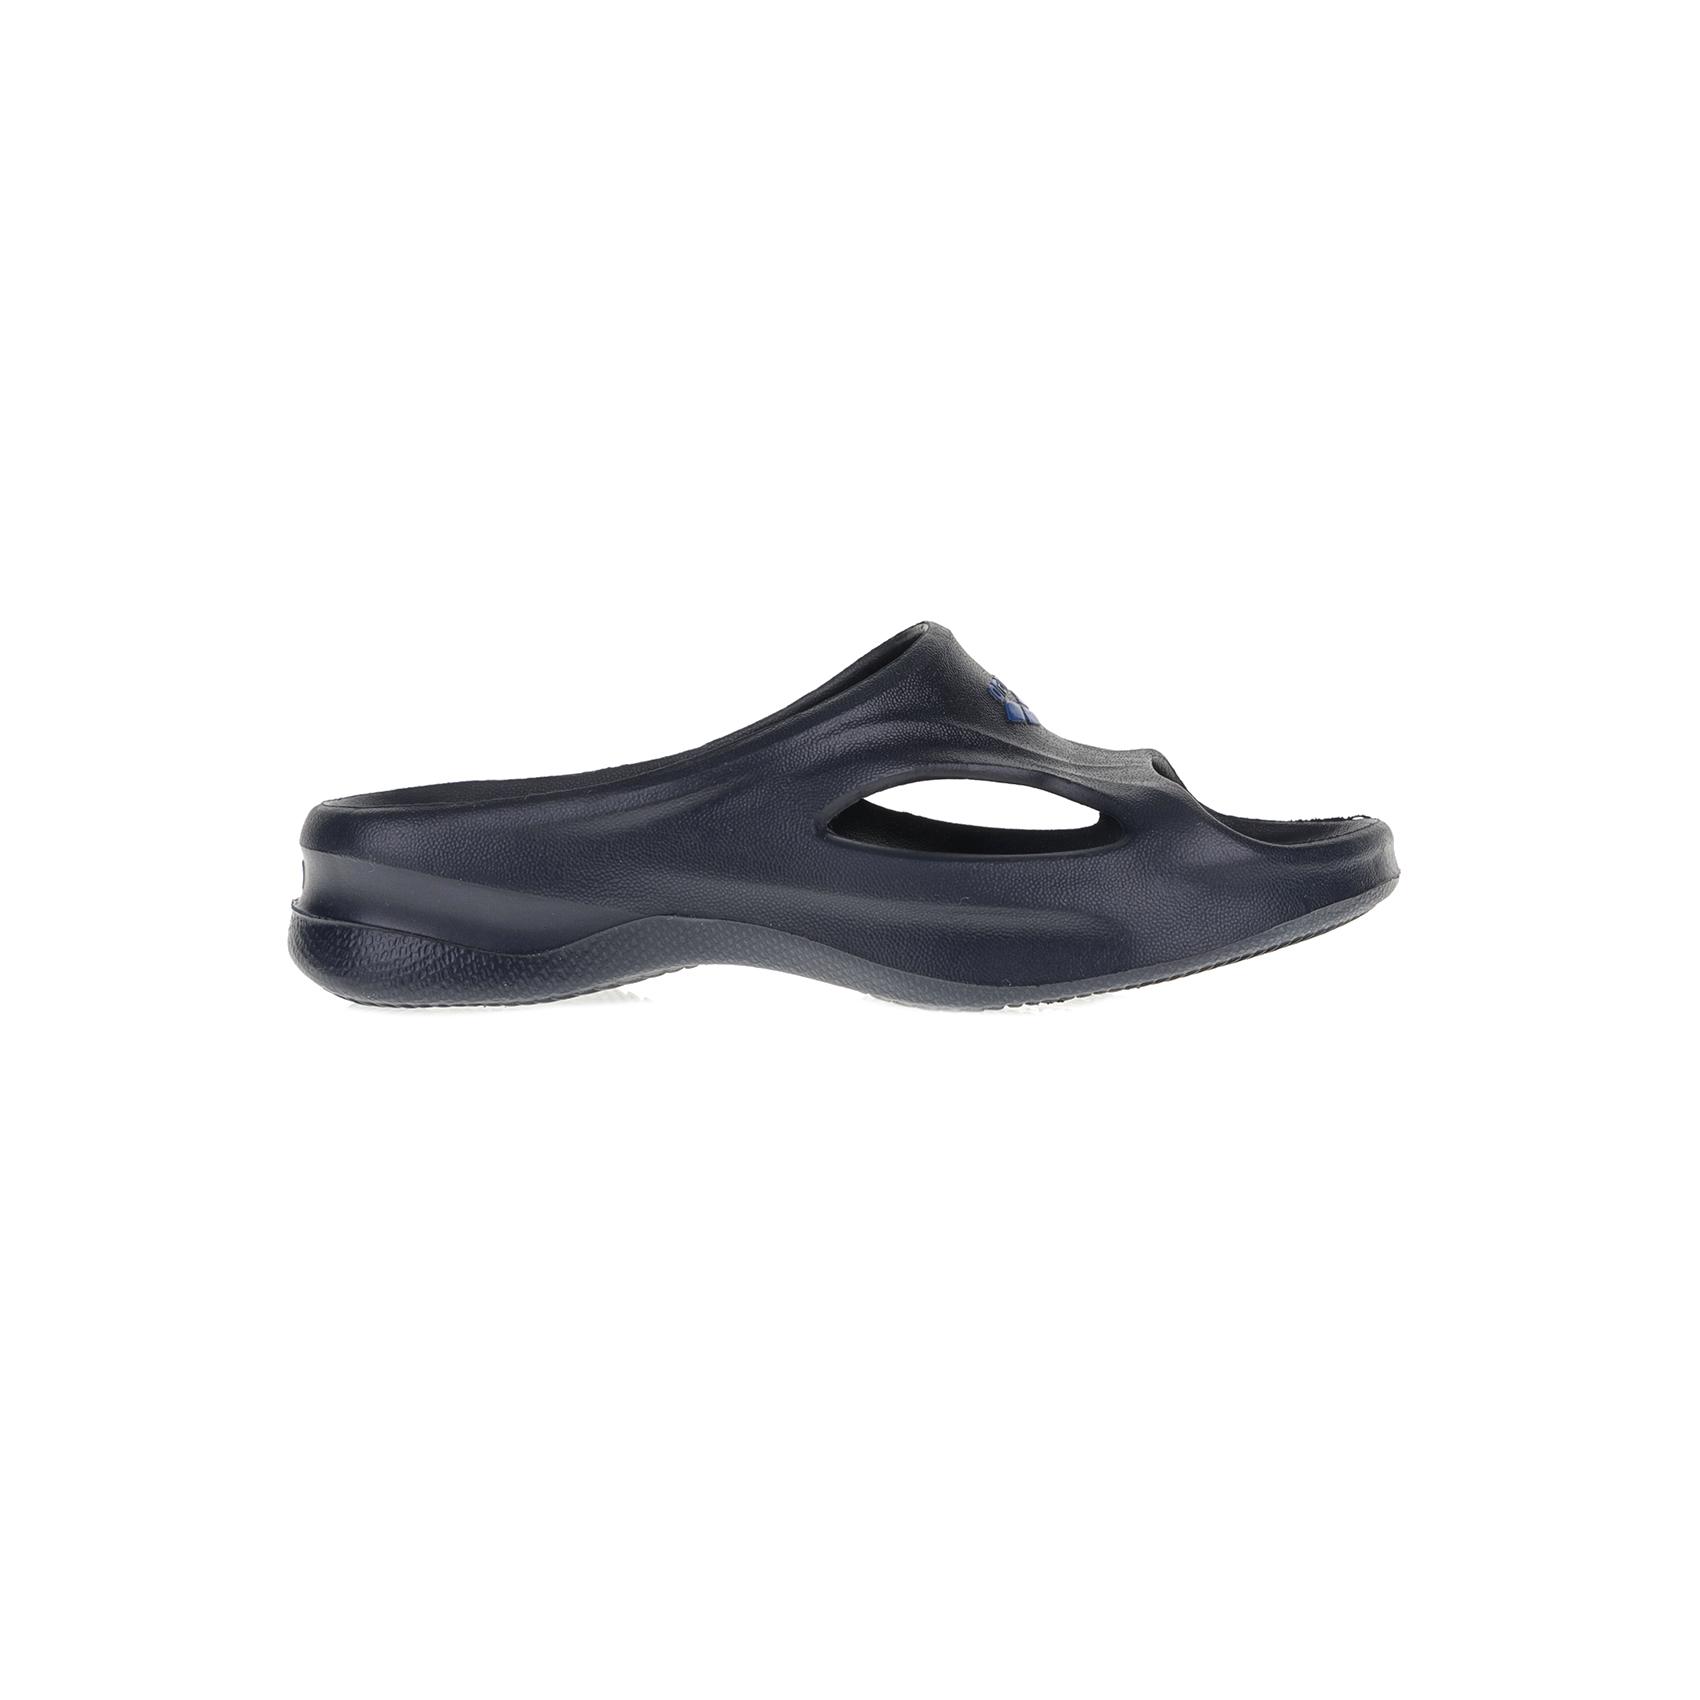 ARENA – Αγορίστικες σαγιονάρες ARENA HYDROSOFT JR μαύρες